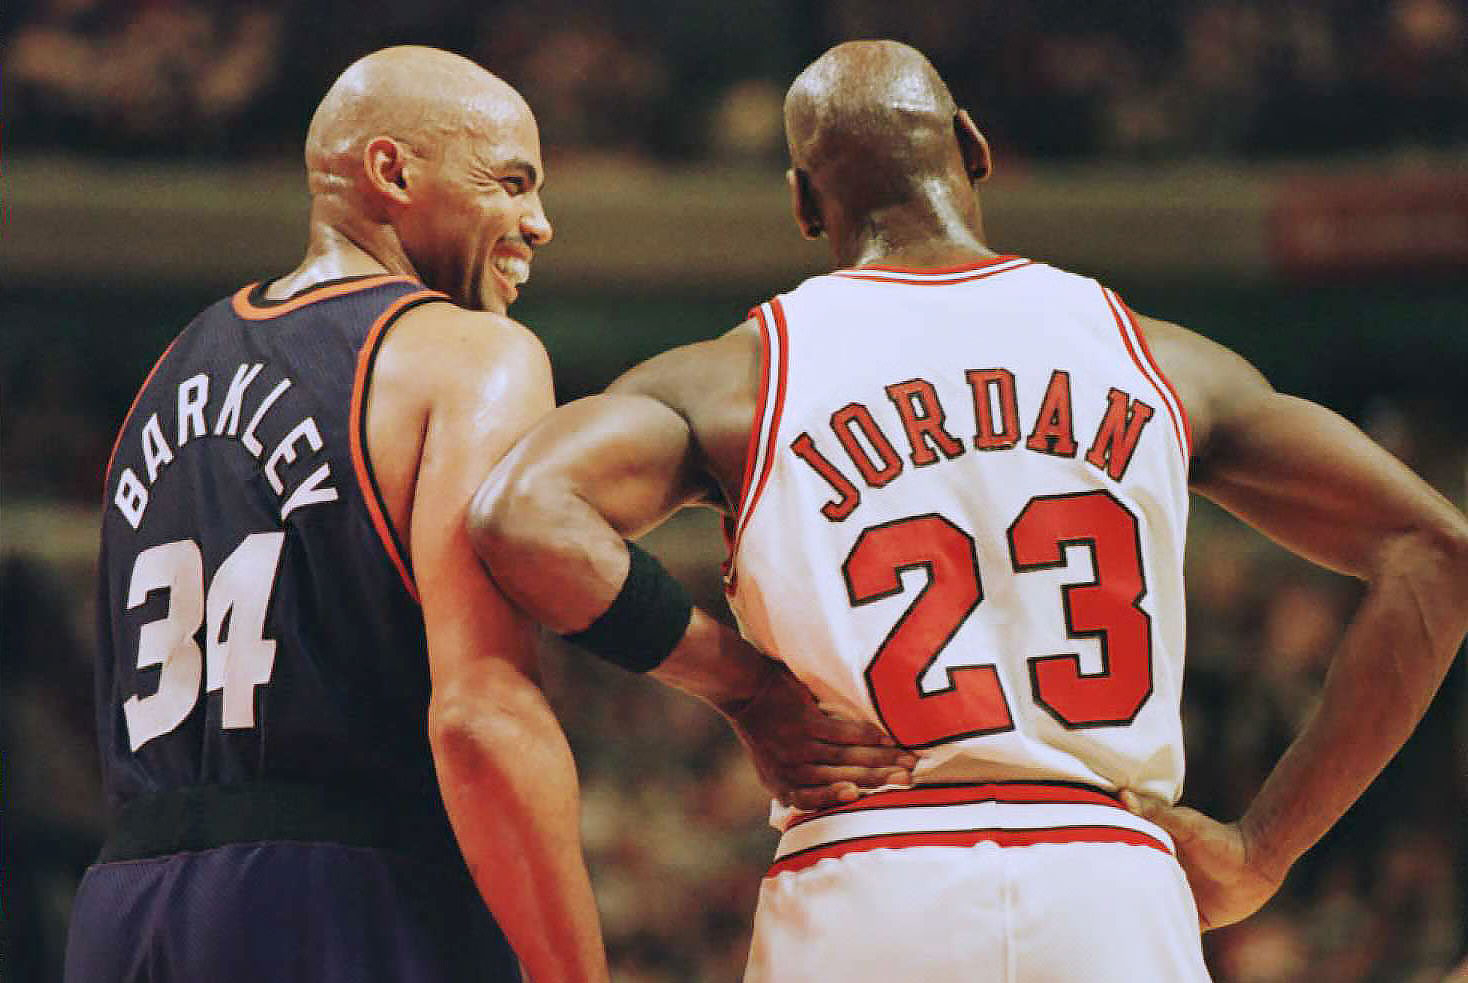 timeless design 3bdb3 6cf1f Why Michael Jordan and Charles Barkley s Friendship Ended